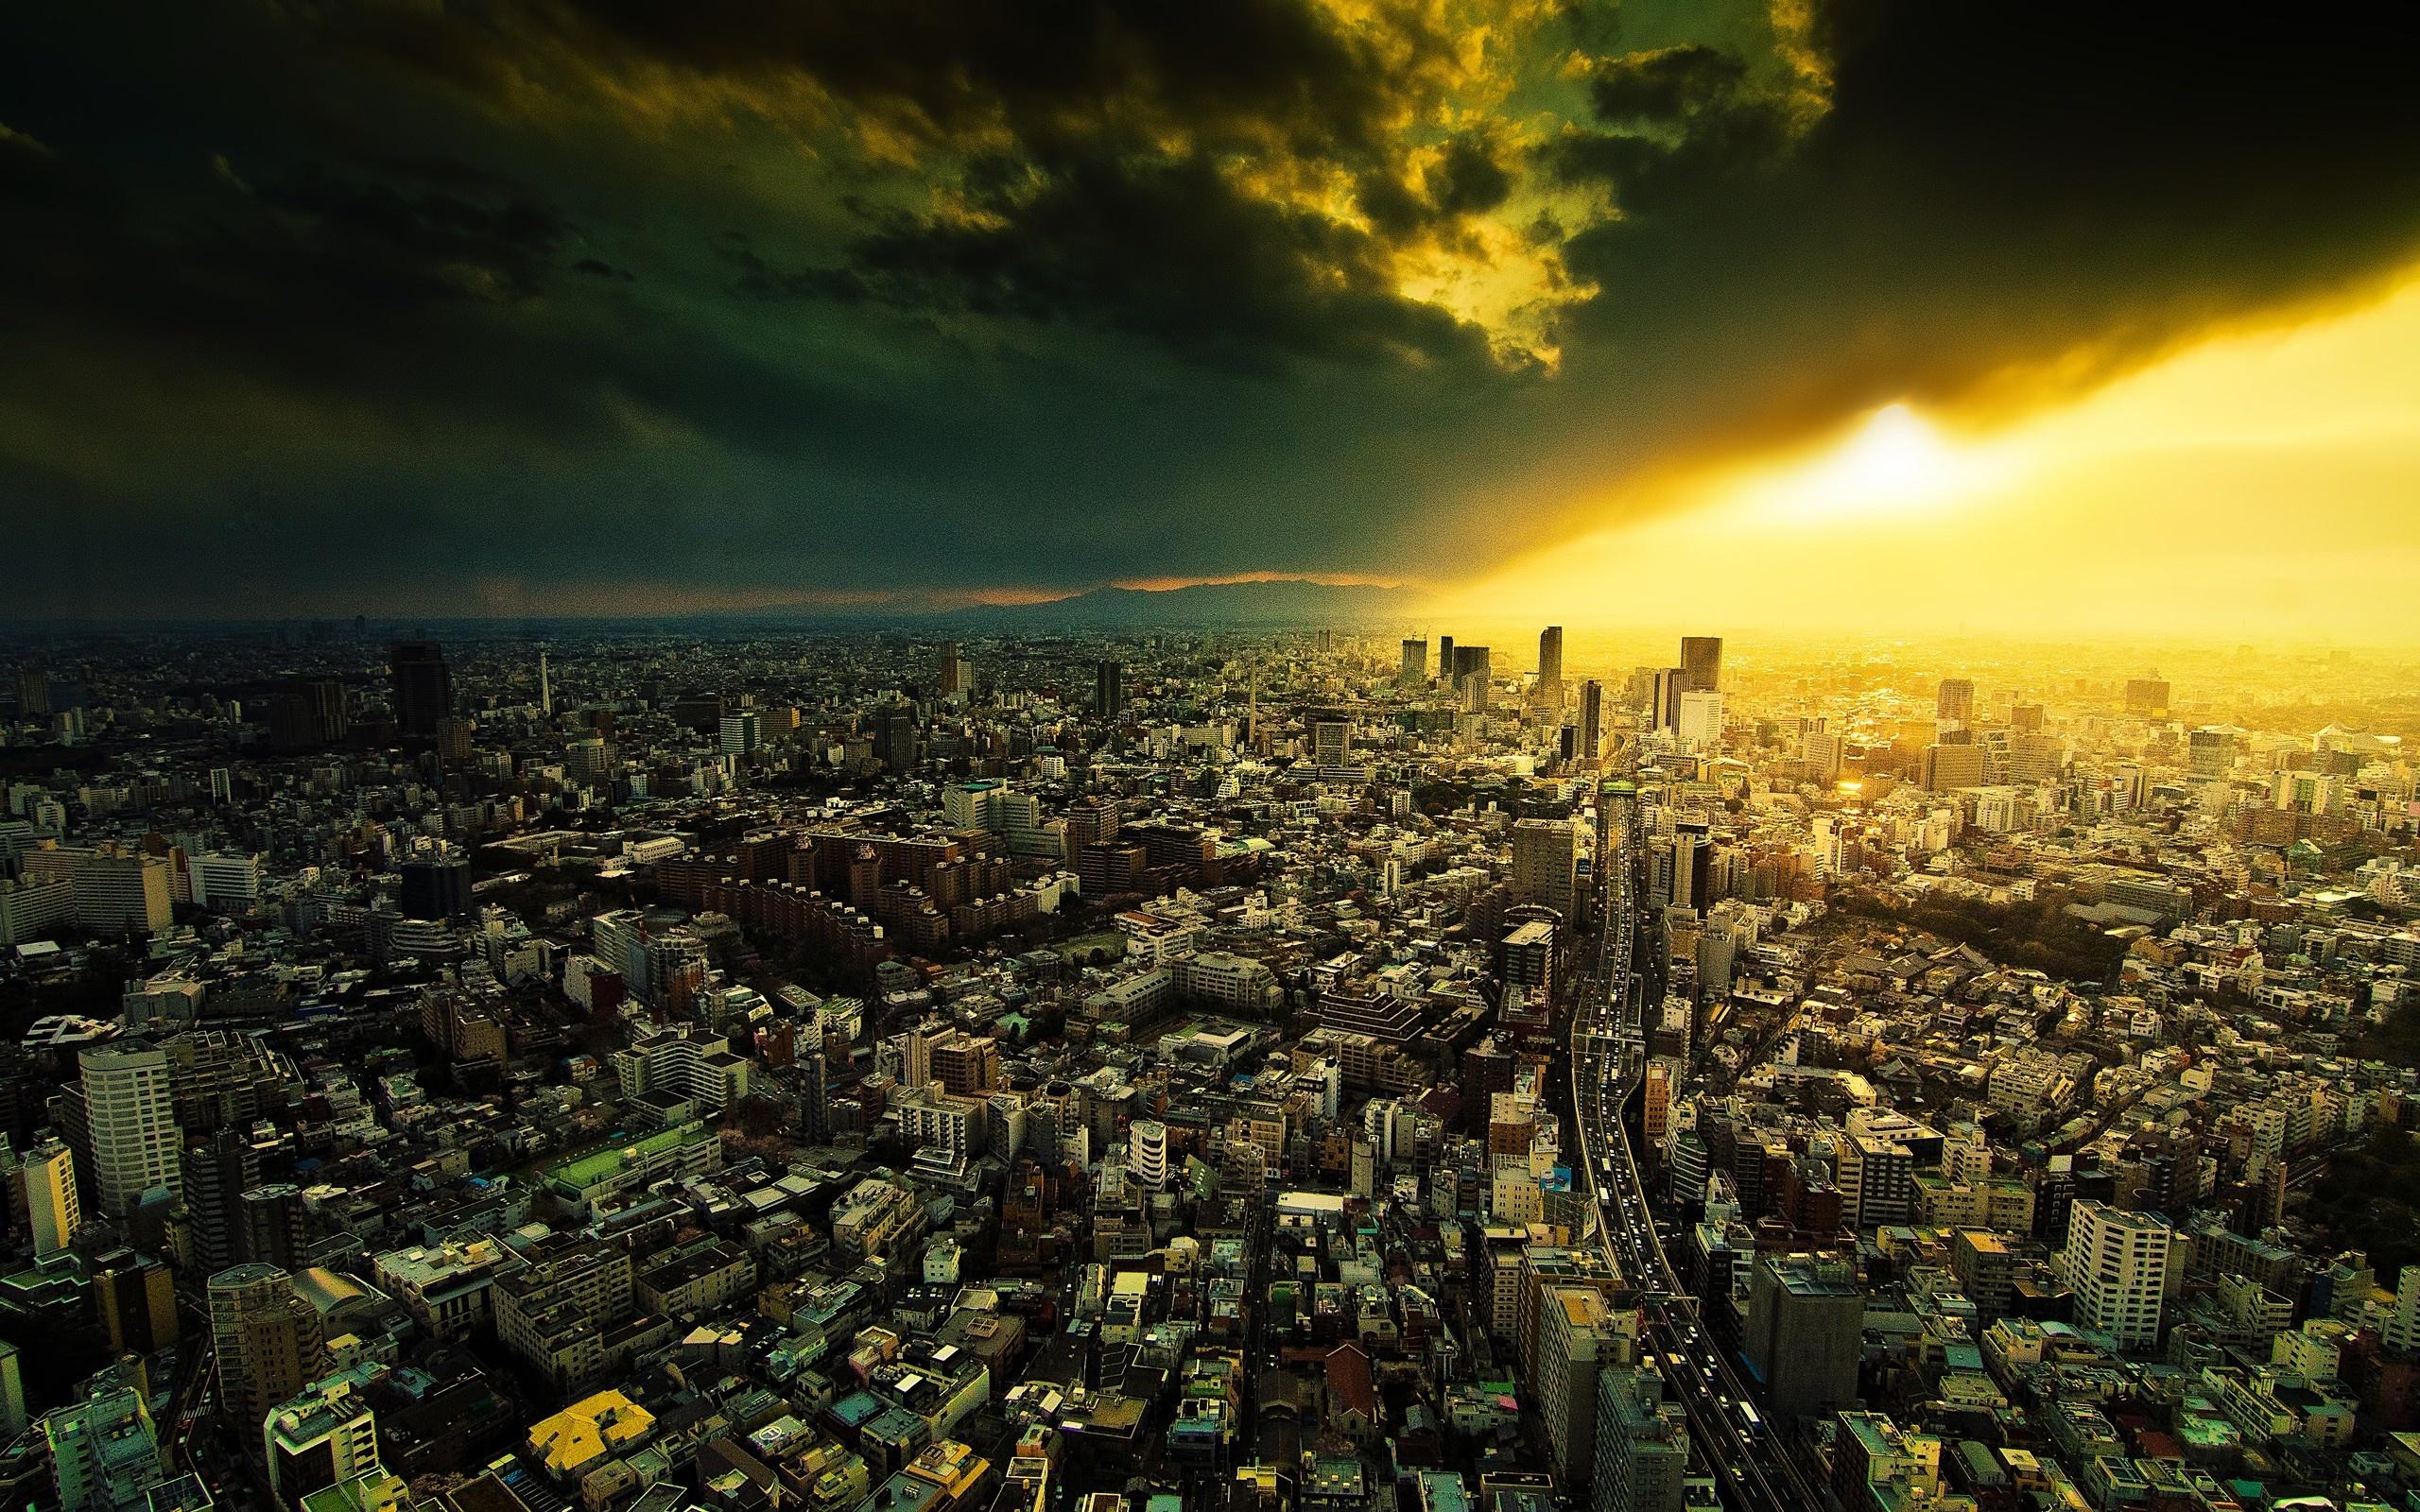 Man Made City 2560x1600